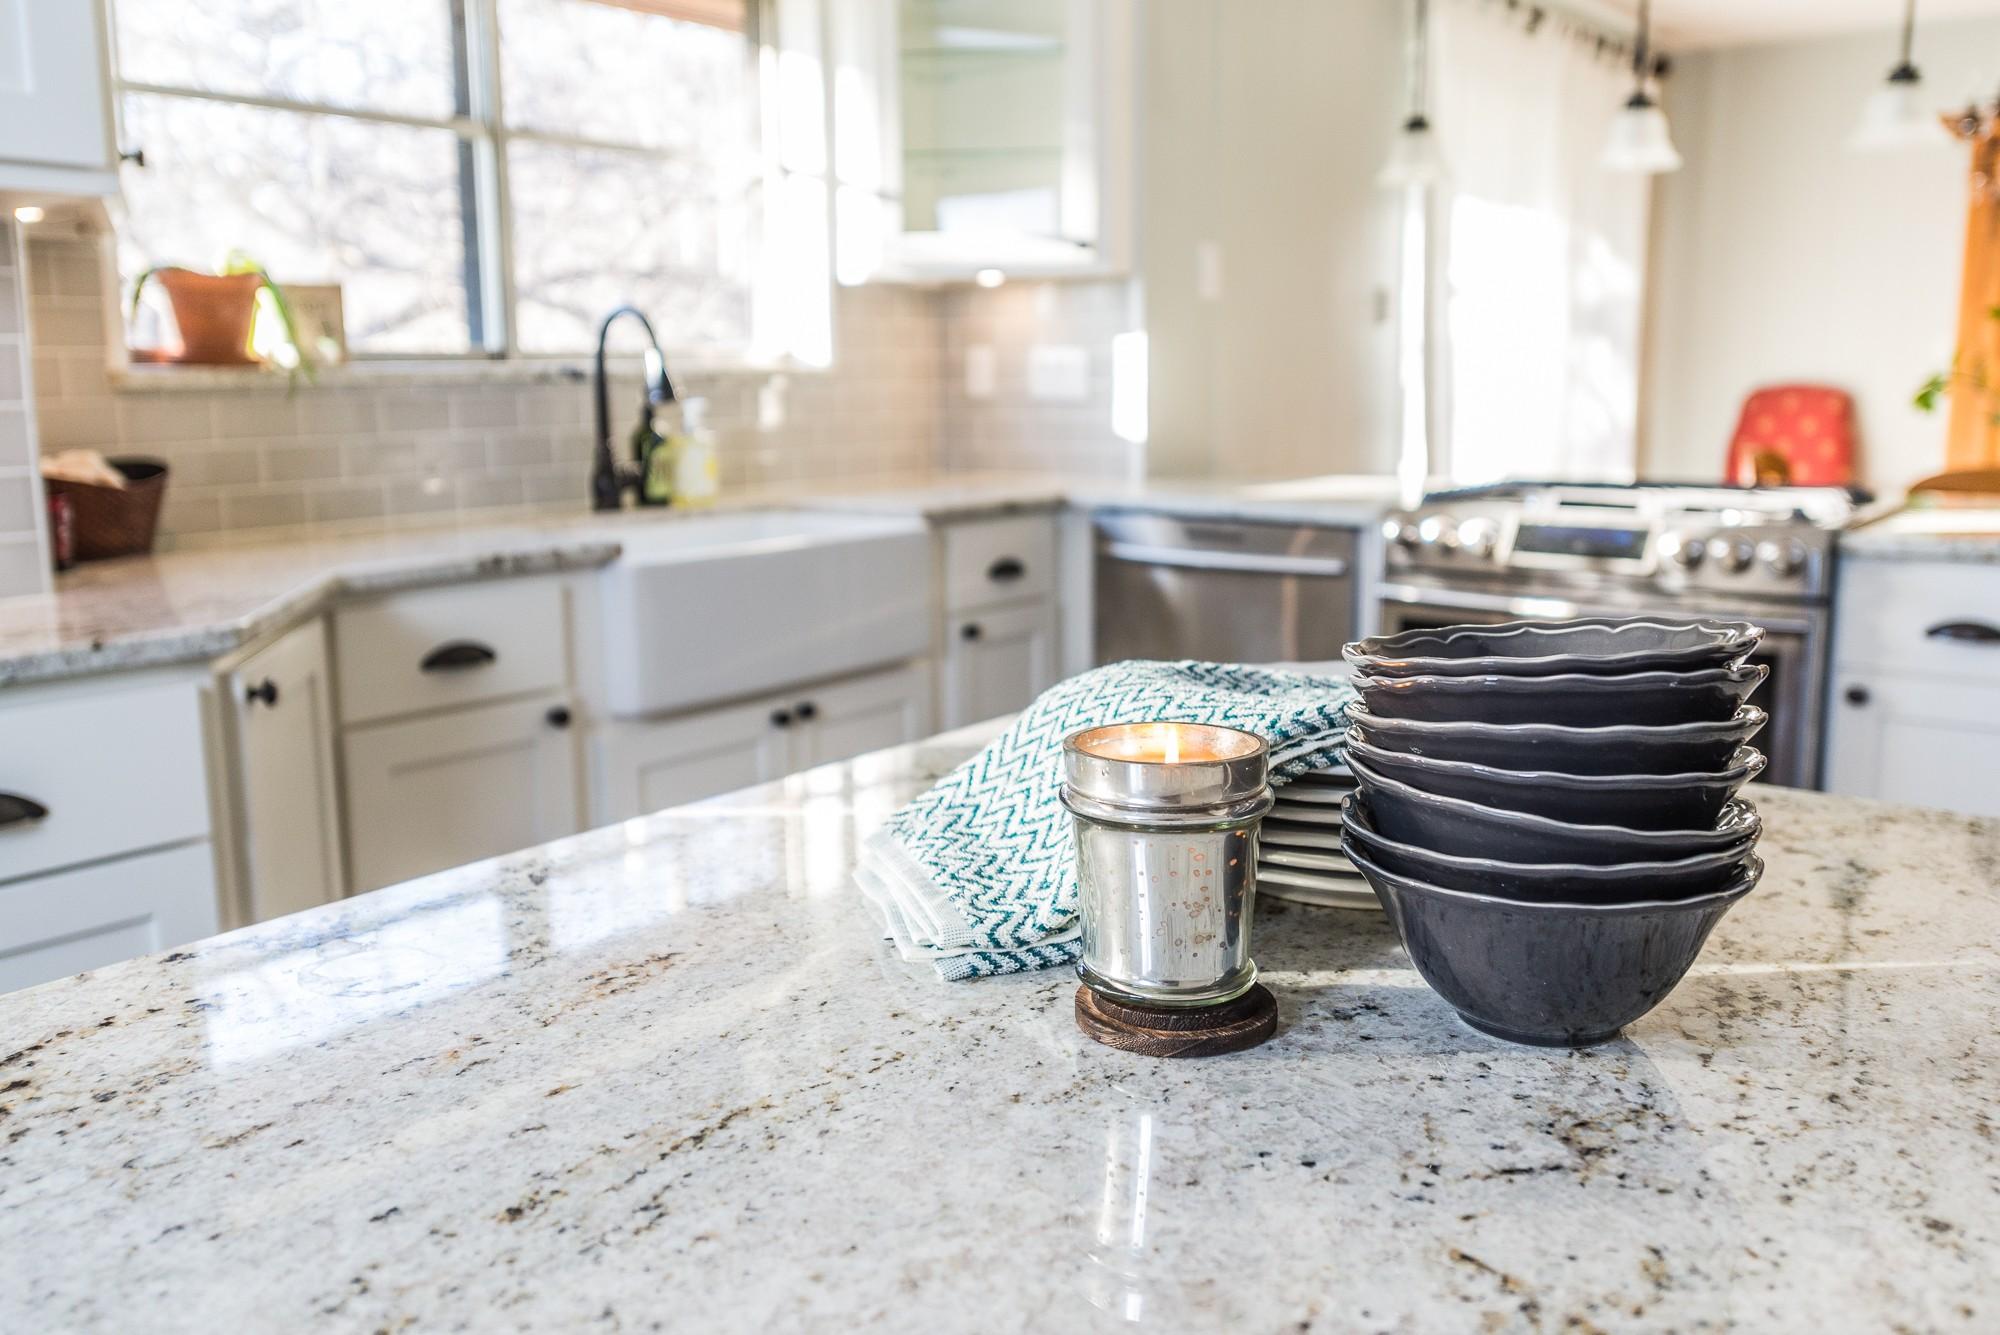 Renovations & Resale Value - Kitchens